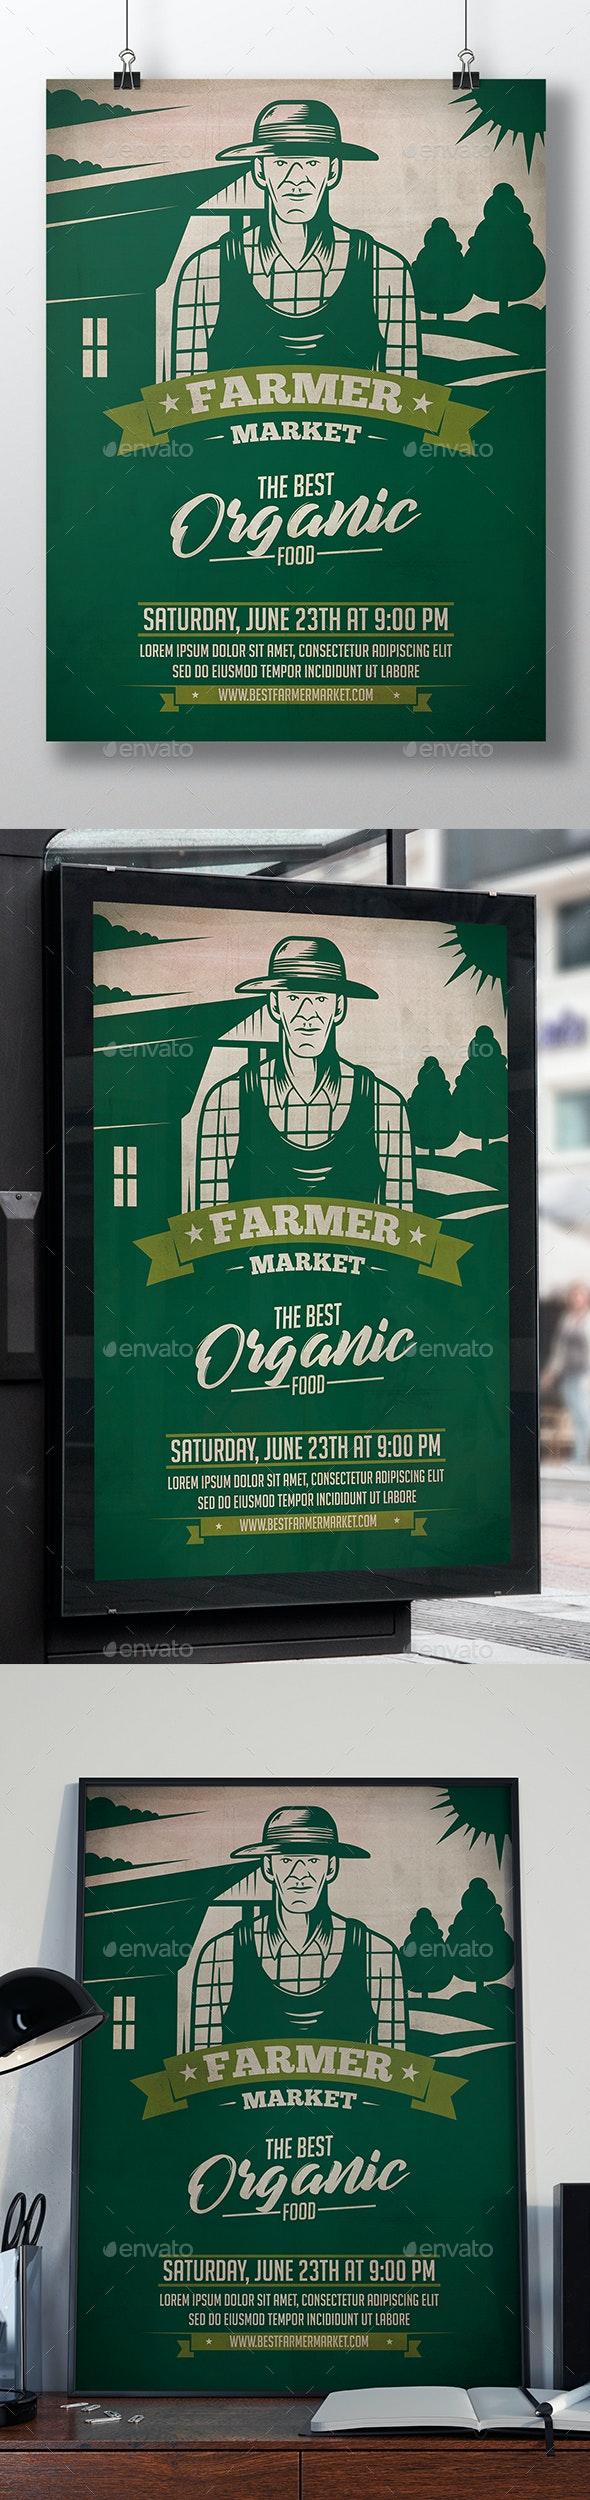 Farmer Market Flyer Template - Events Flyers